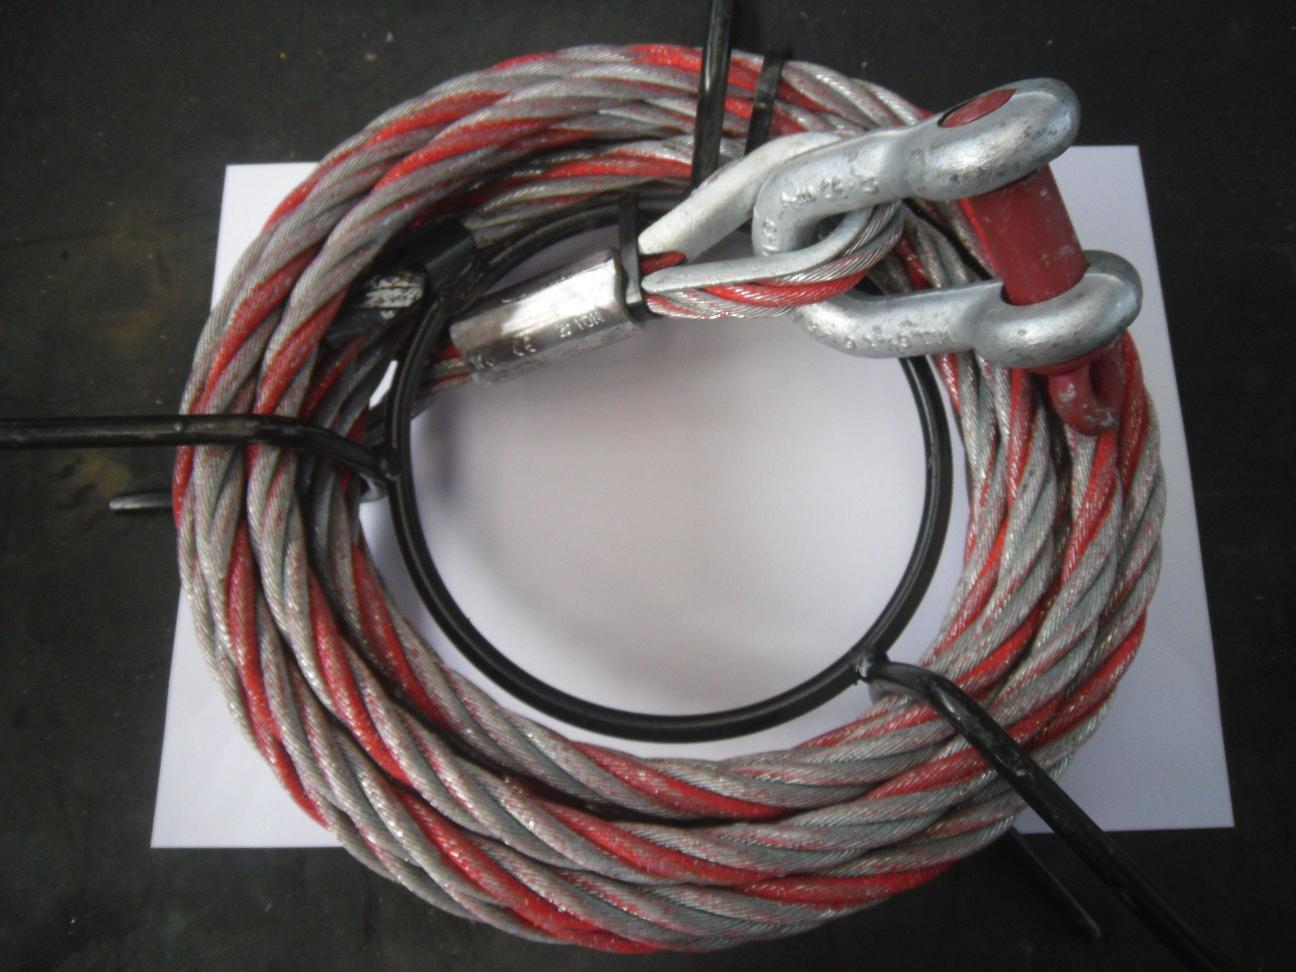 Tirfor 10m Long 16.3mm Diameter Wire Rope 3200kg SWL